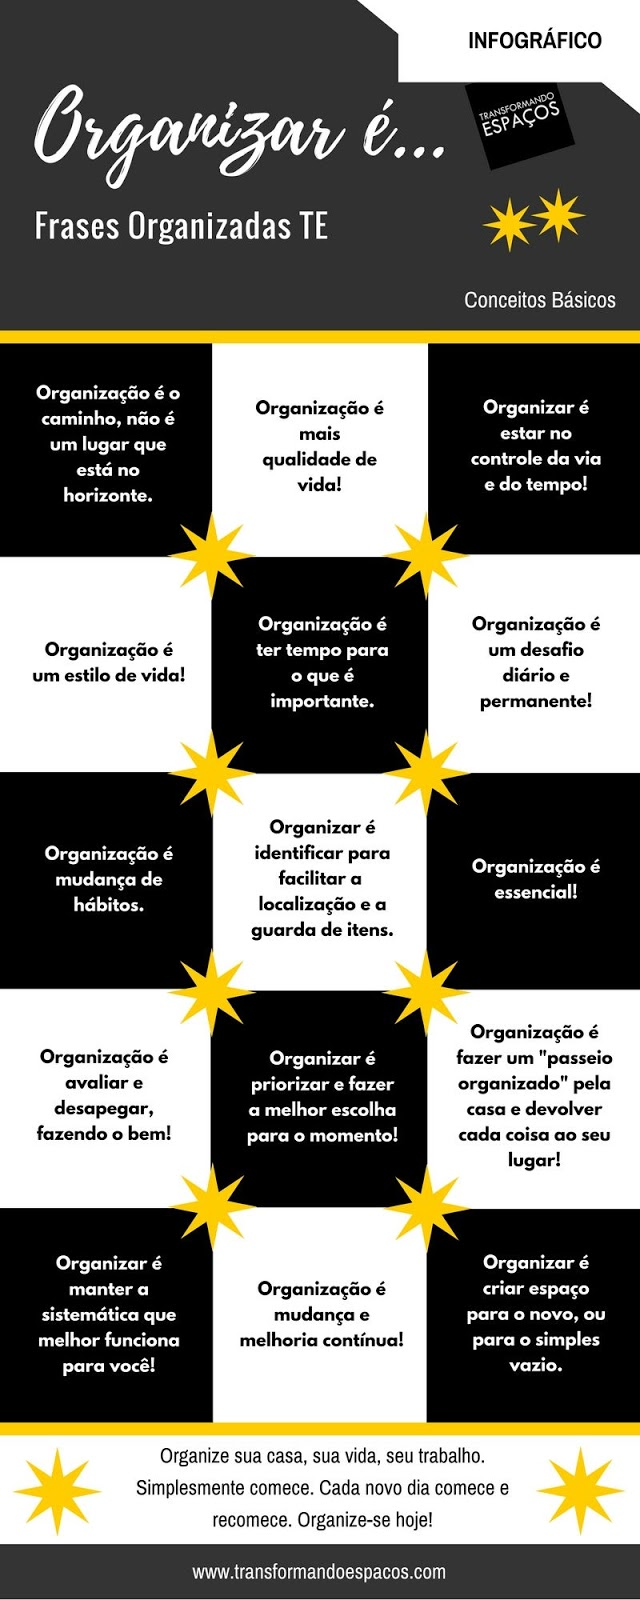 Infográfico: Frases Organizadas TE #Organizaré...